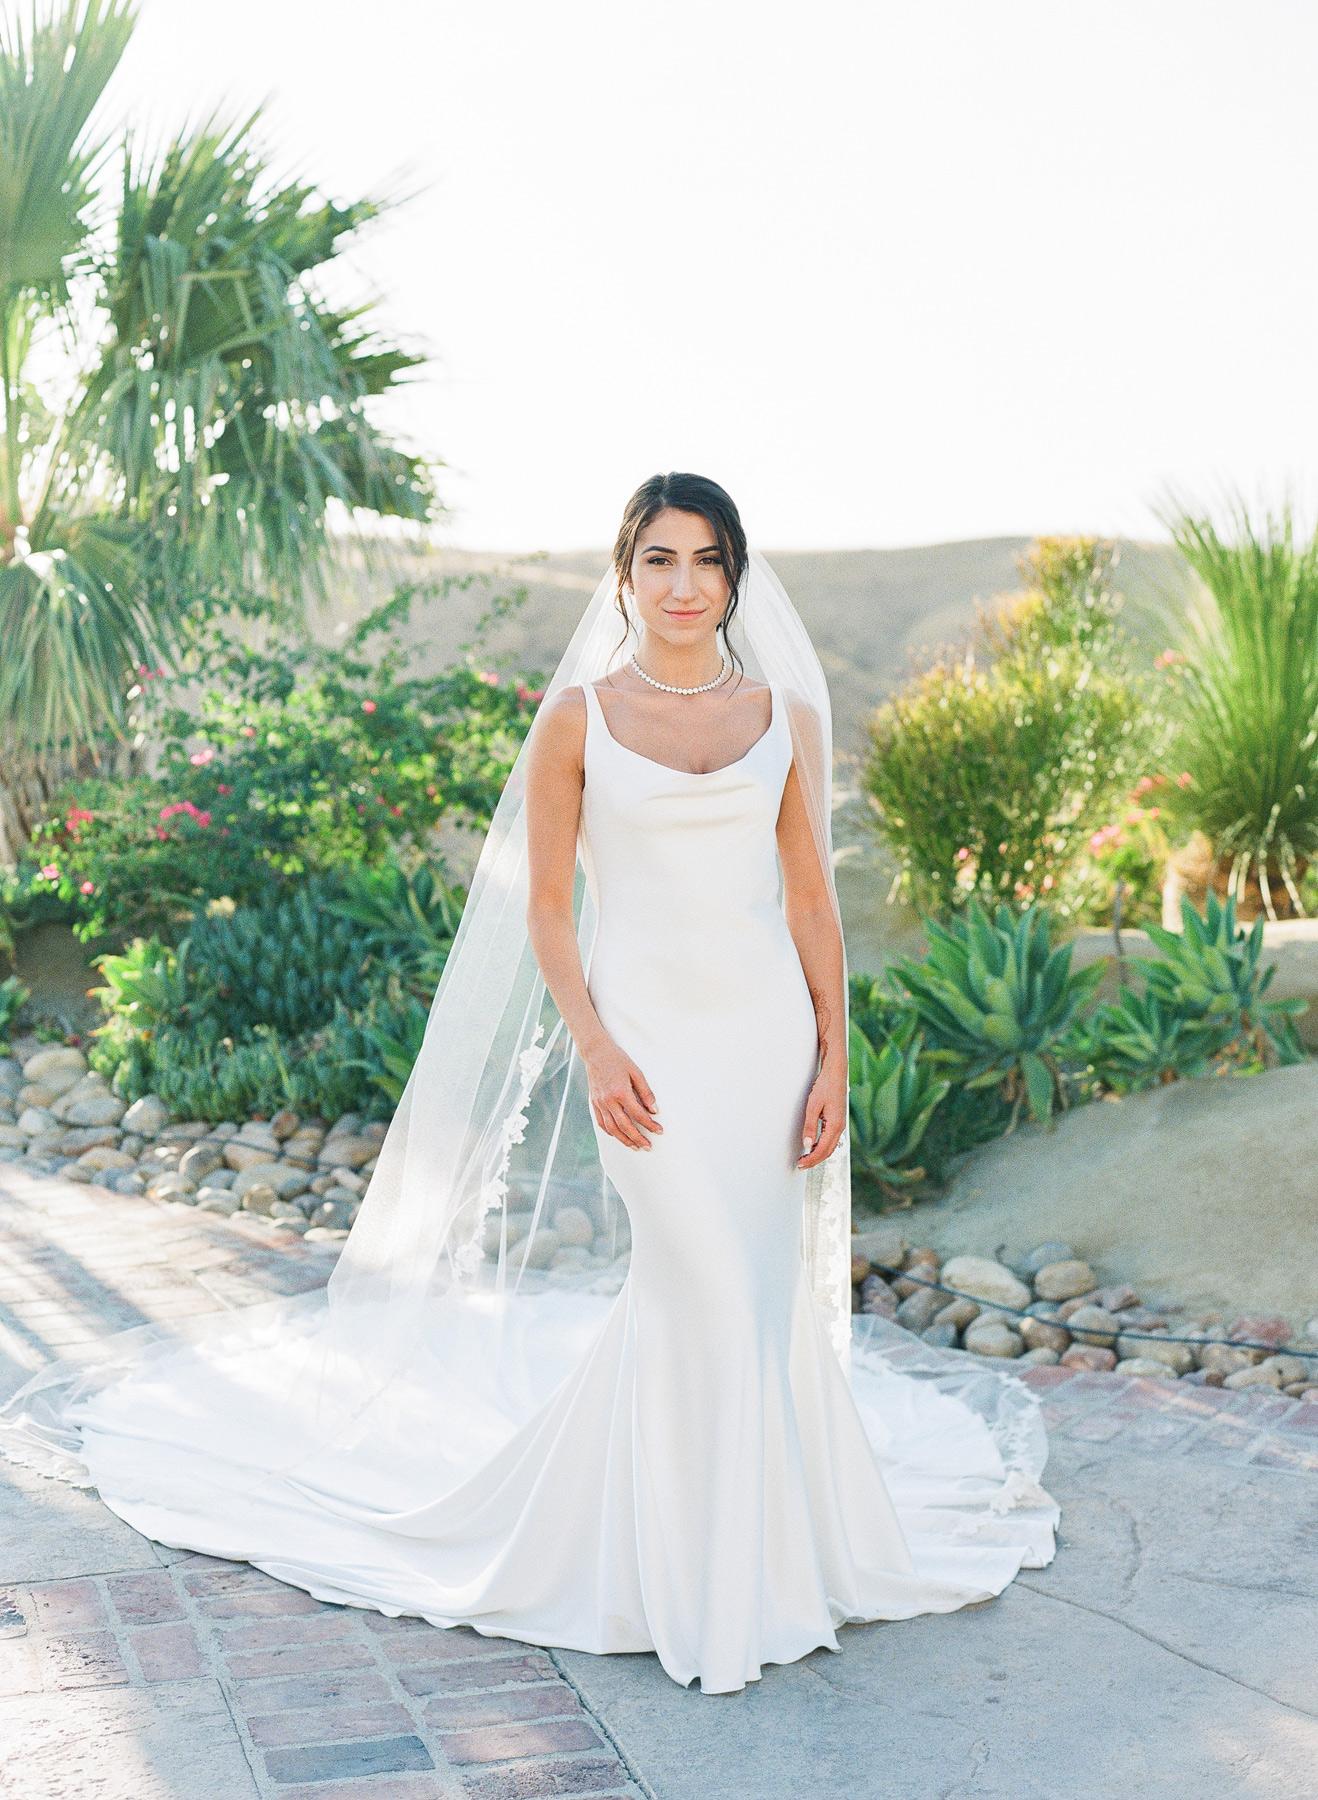 outdoor portrait Sasha in traditional white wedding dress